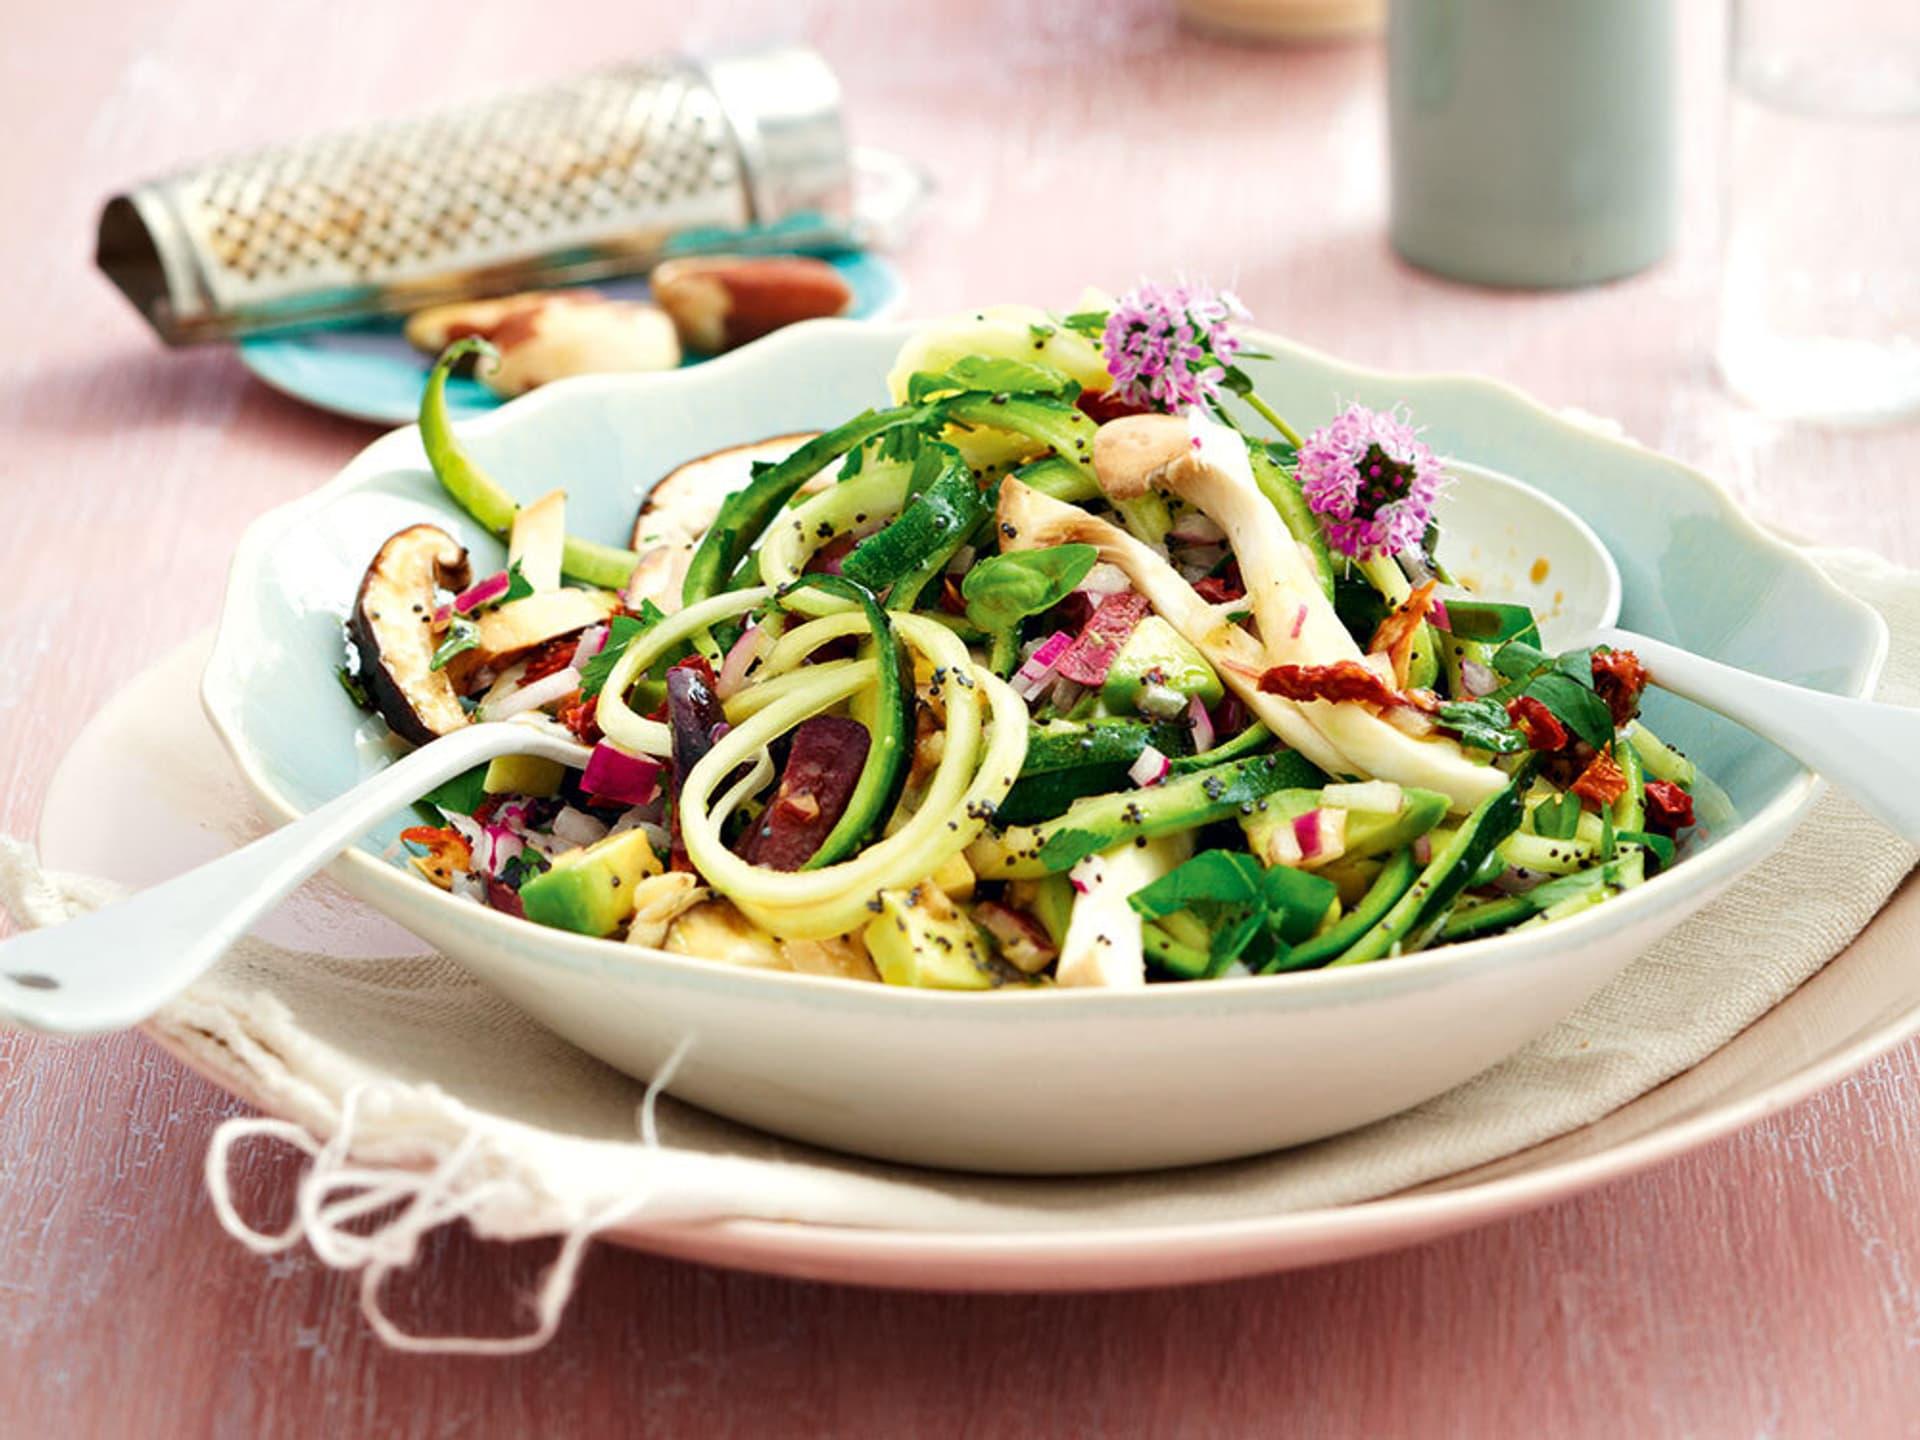 Zucchini-Tonarelli mit Pilzen und Mohn